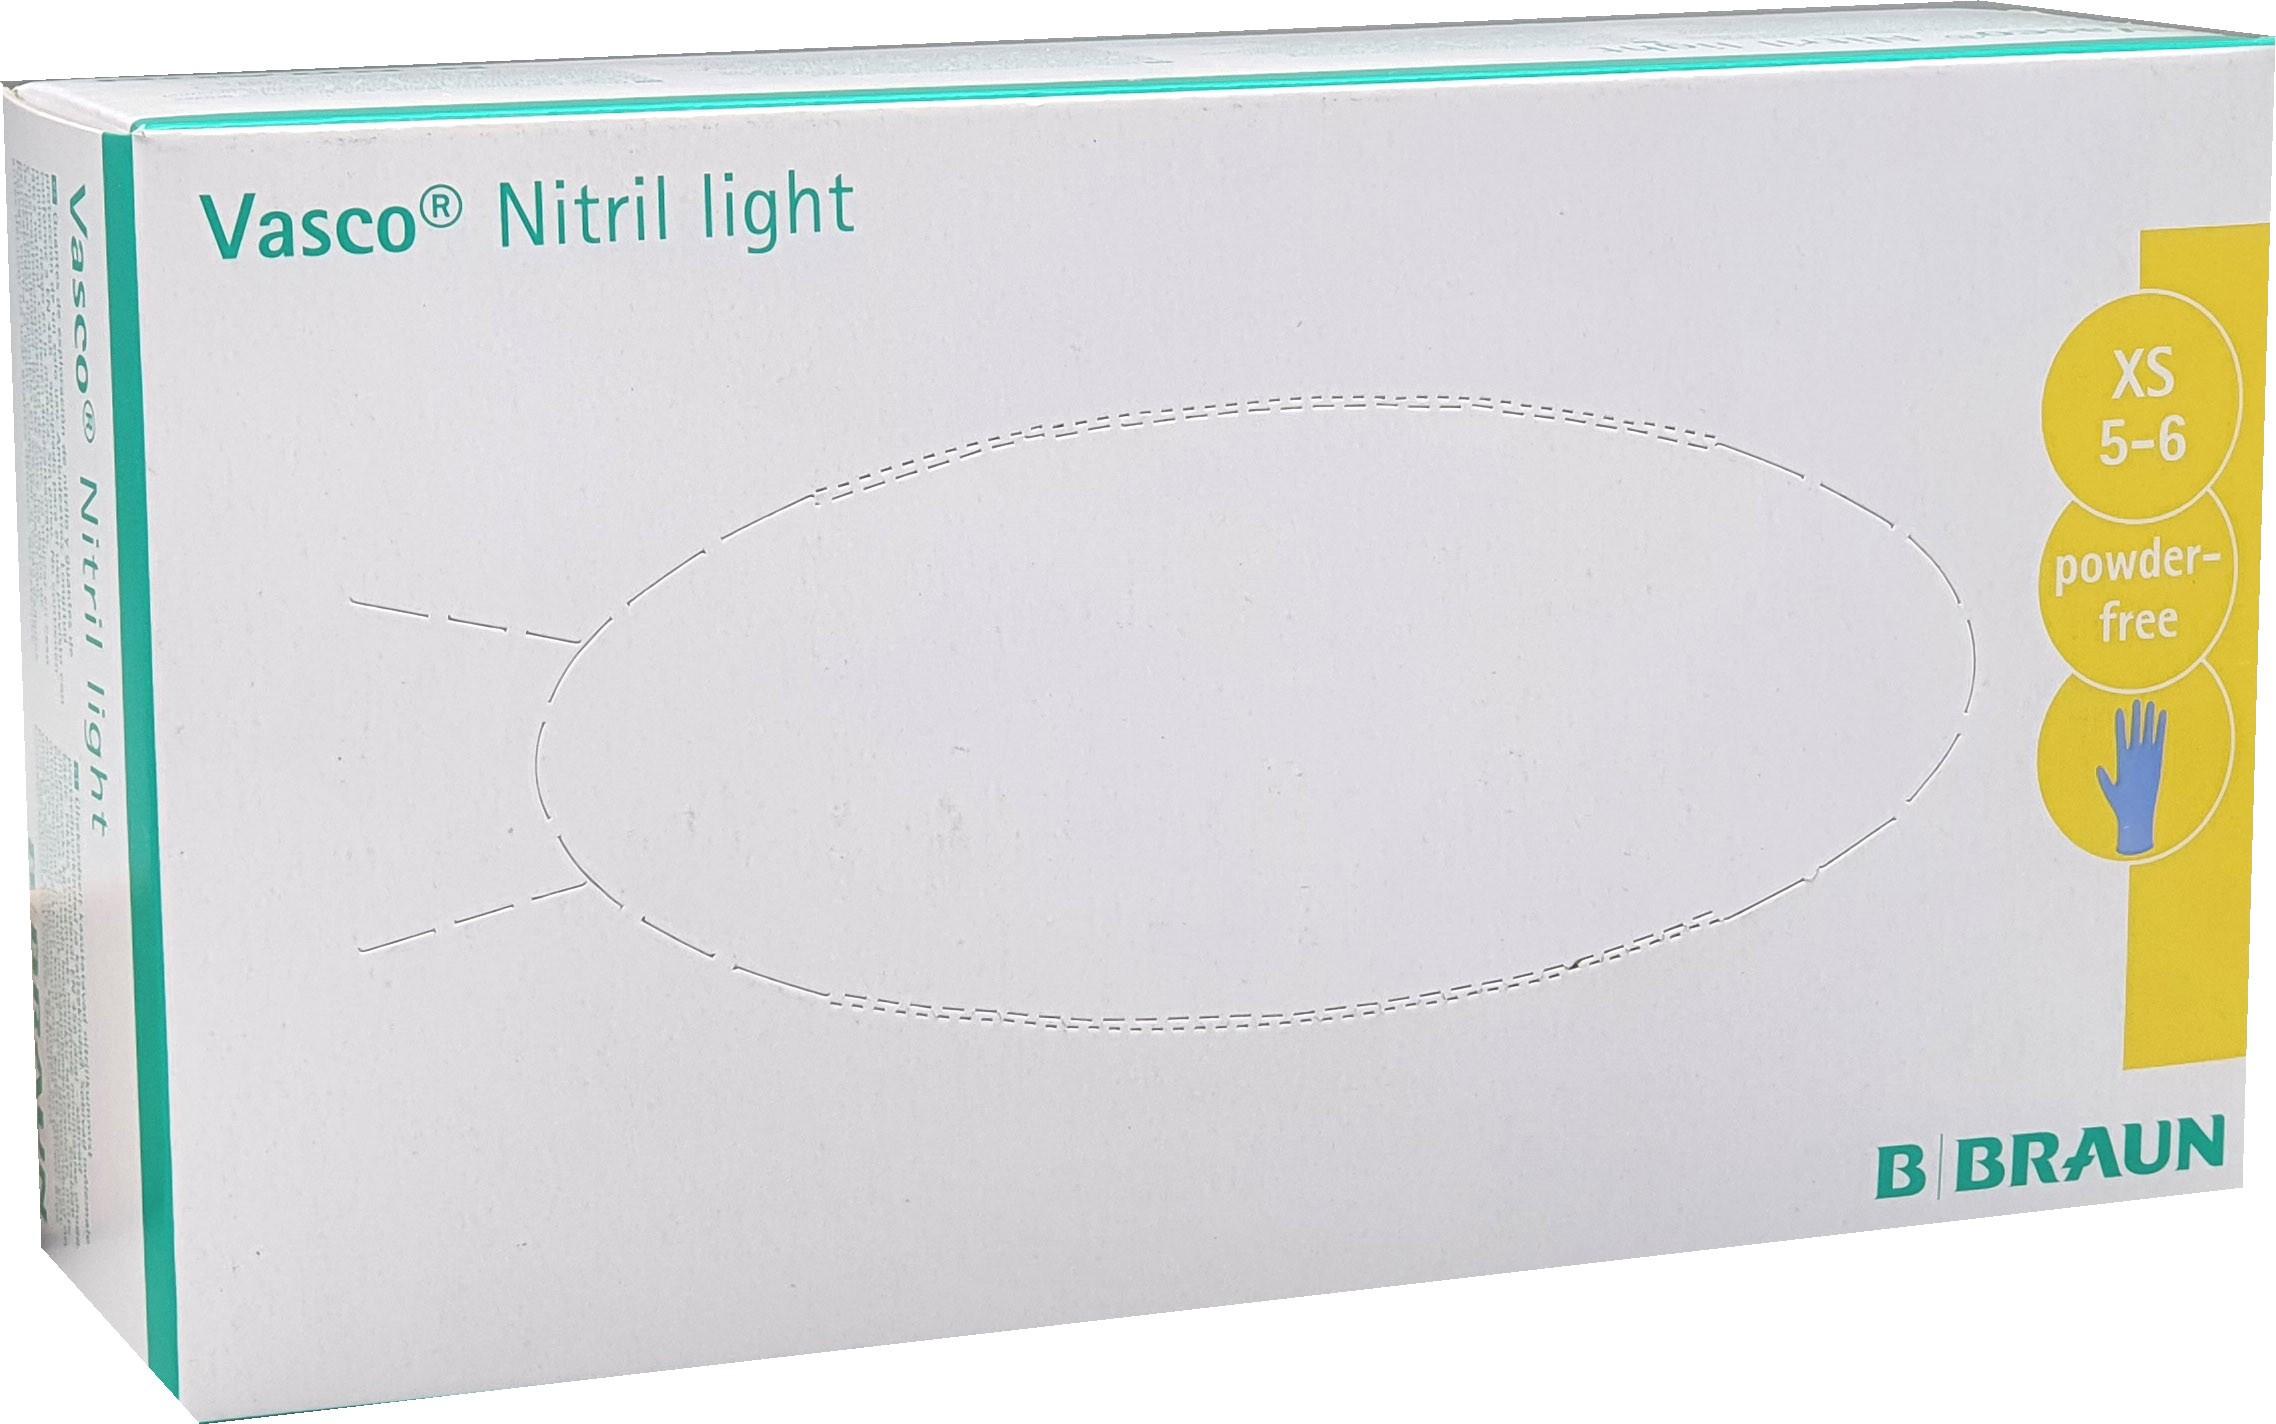 Untersuchungshandschuhe Nitril Vasco light XS